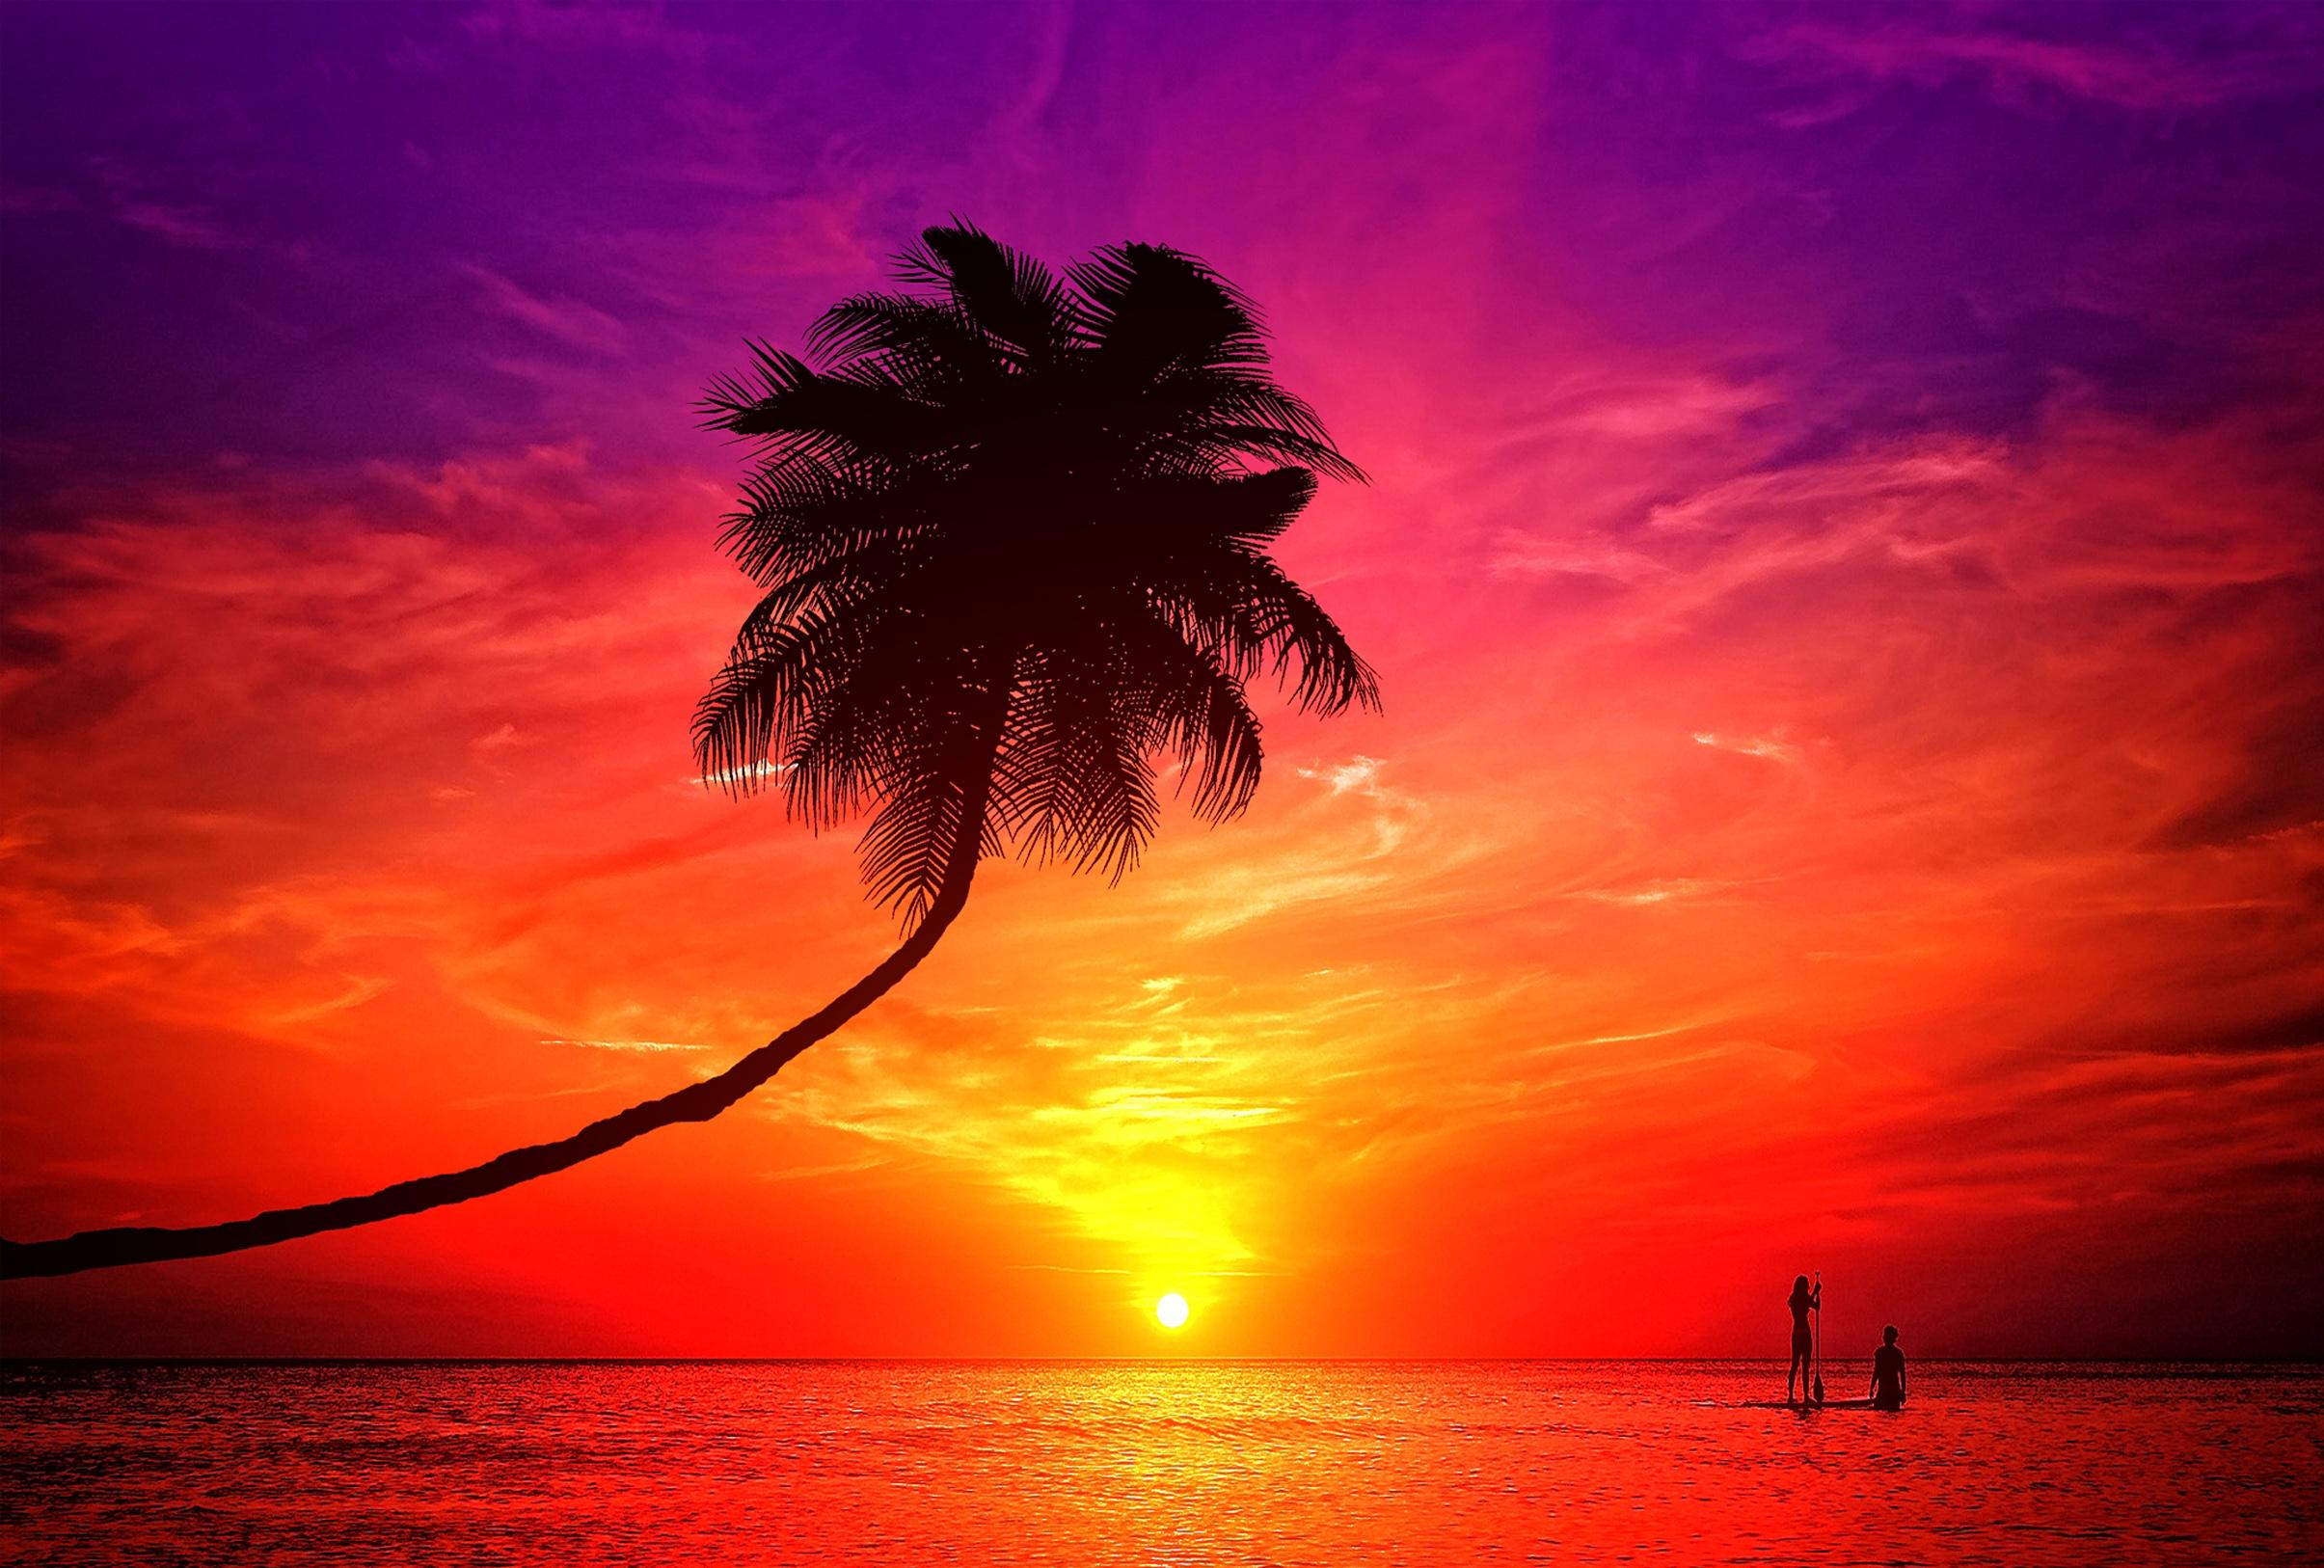 A romantic couple enjoying the sunset photo